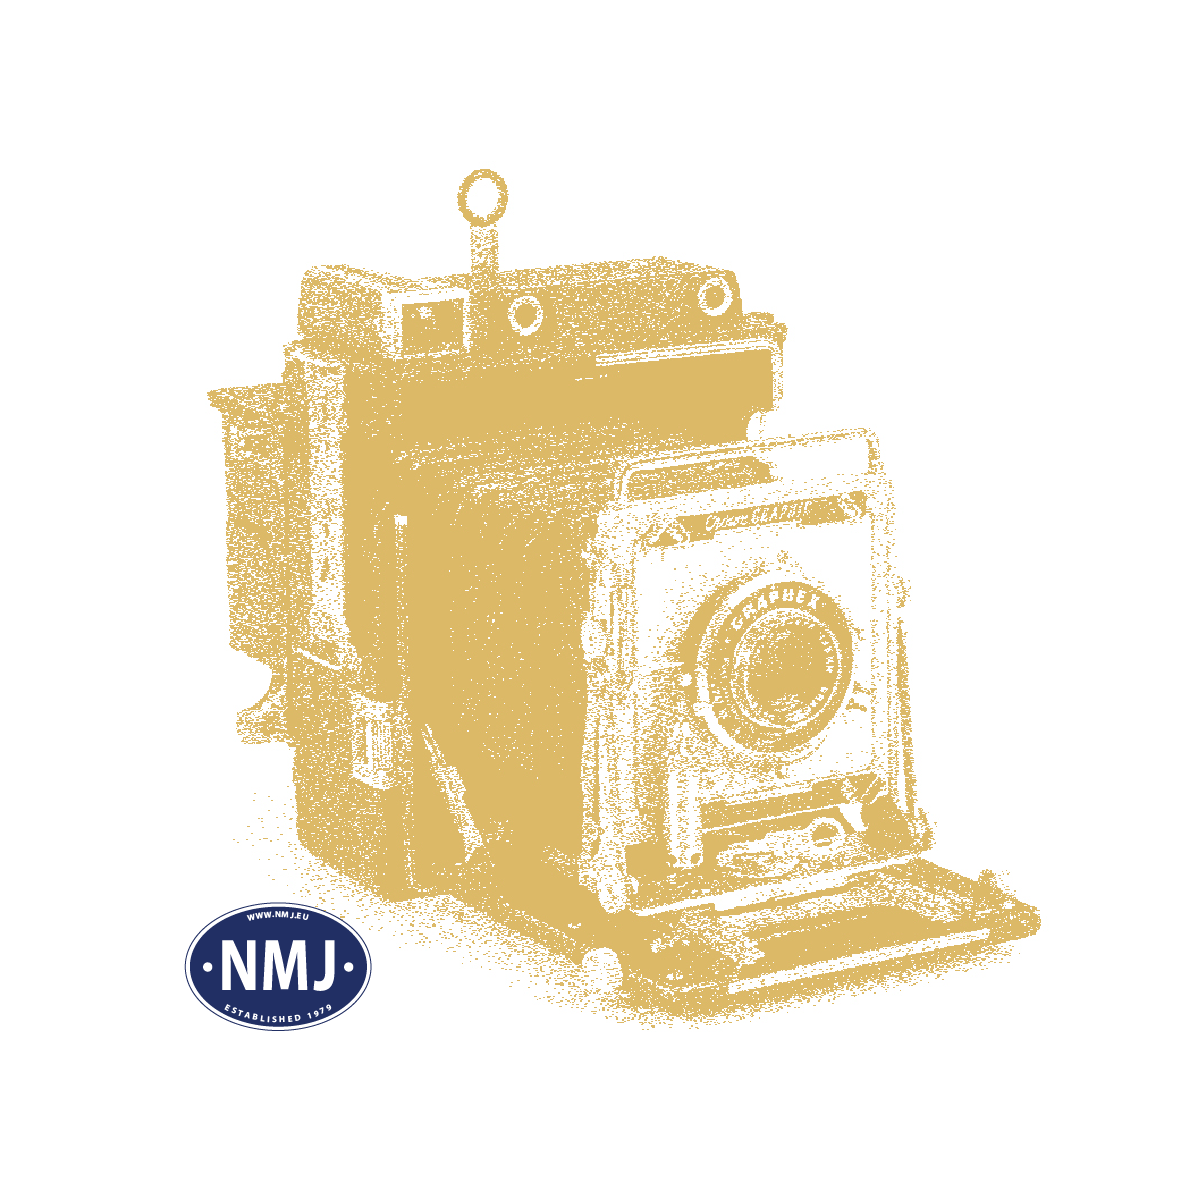 NMJT506.306 - NMJ Topline NSB Xbms 40 76 953 5013-9